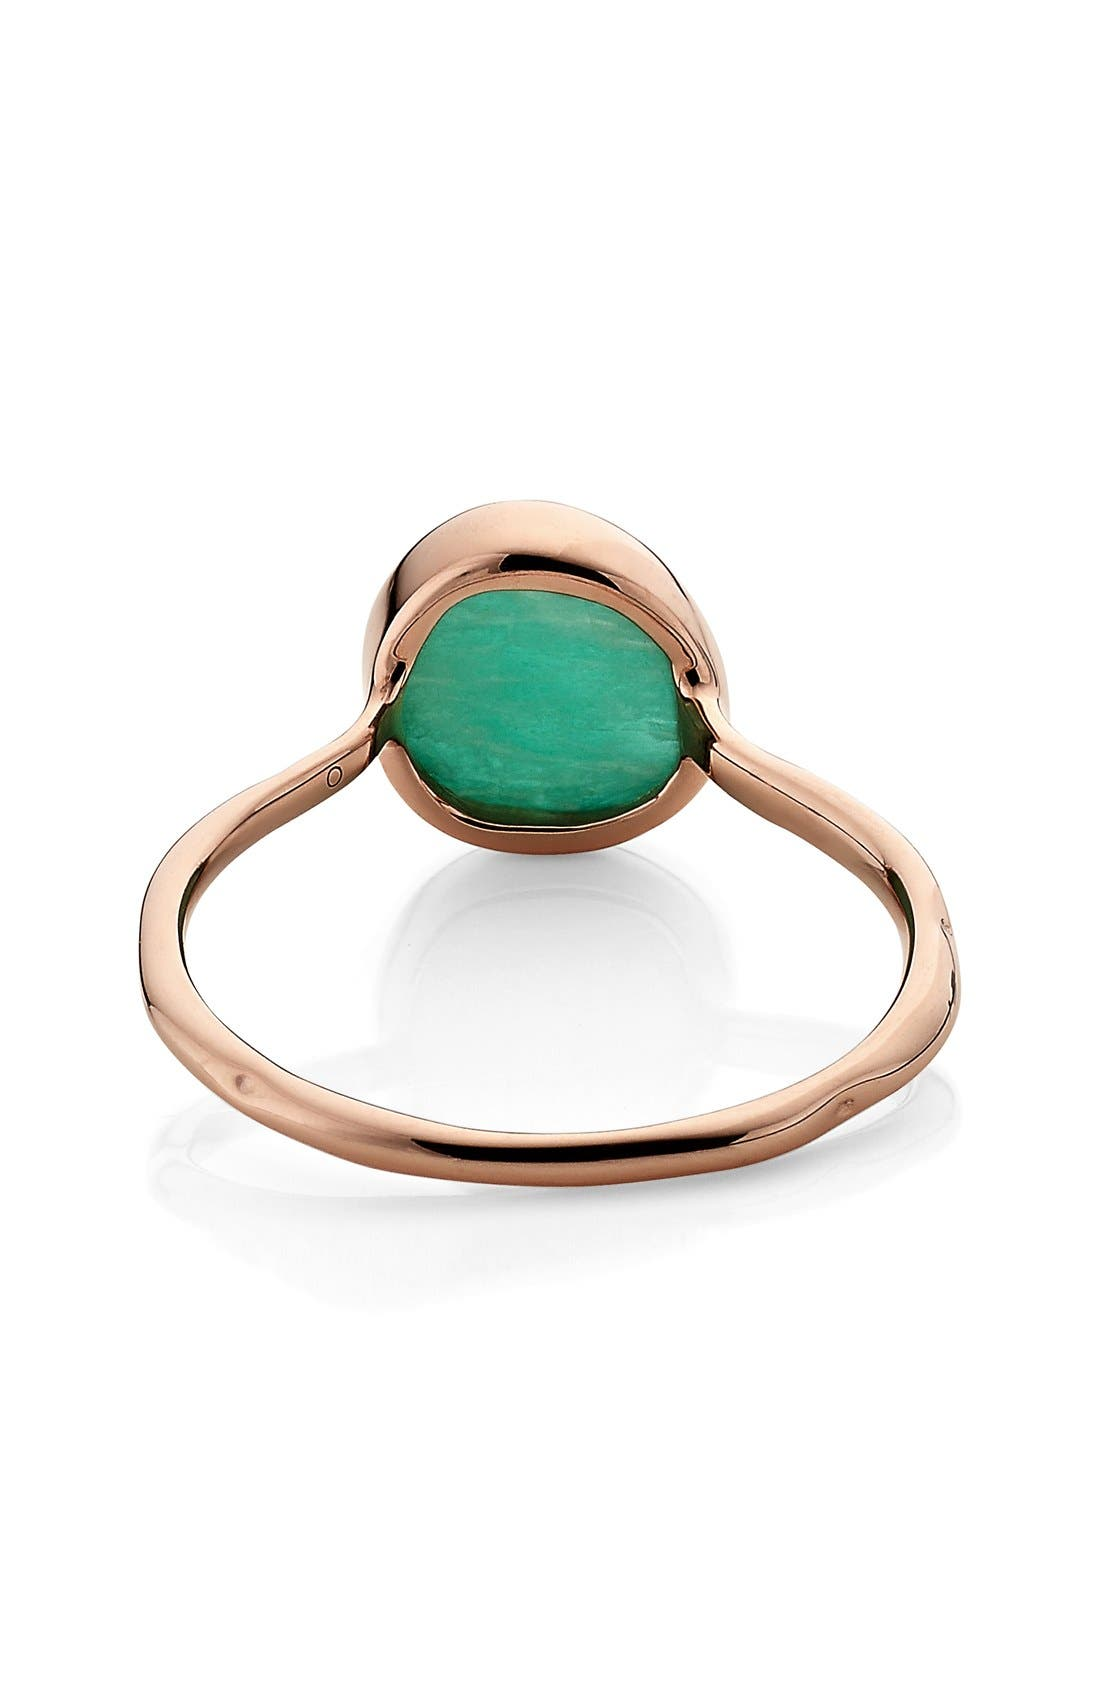 Siren Semiprecious Stone Stacking Ring,                             Alternate thumbnail 4, color,                             ROSE GOLD/ AMAZONITE